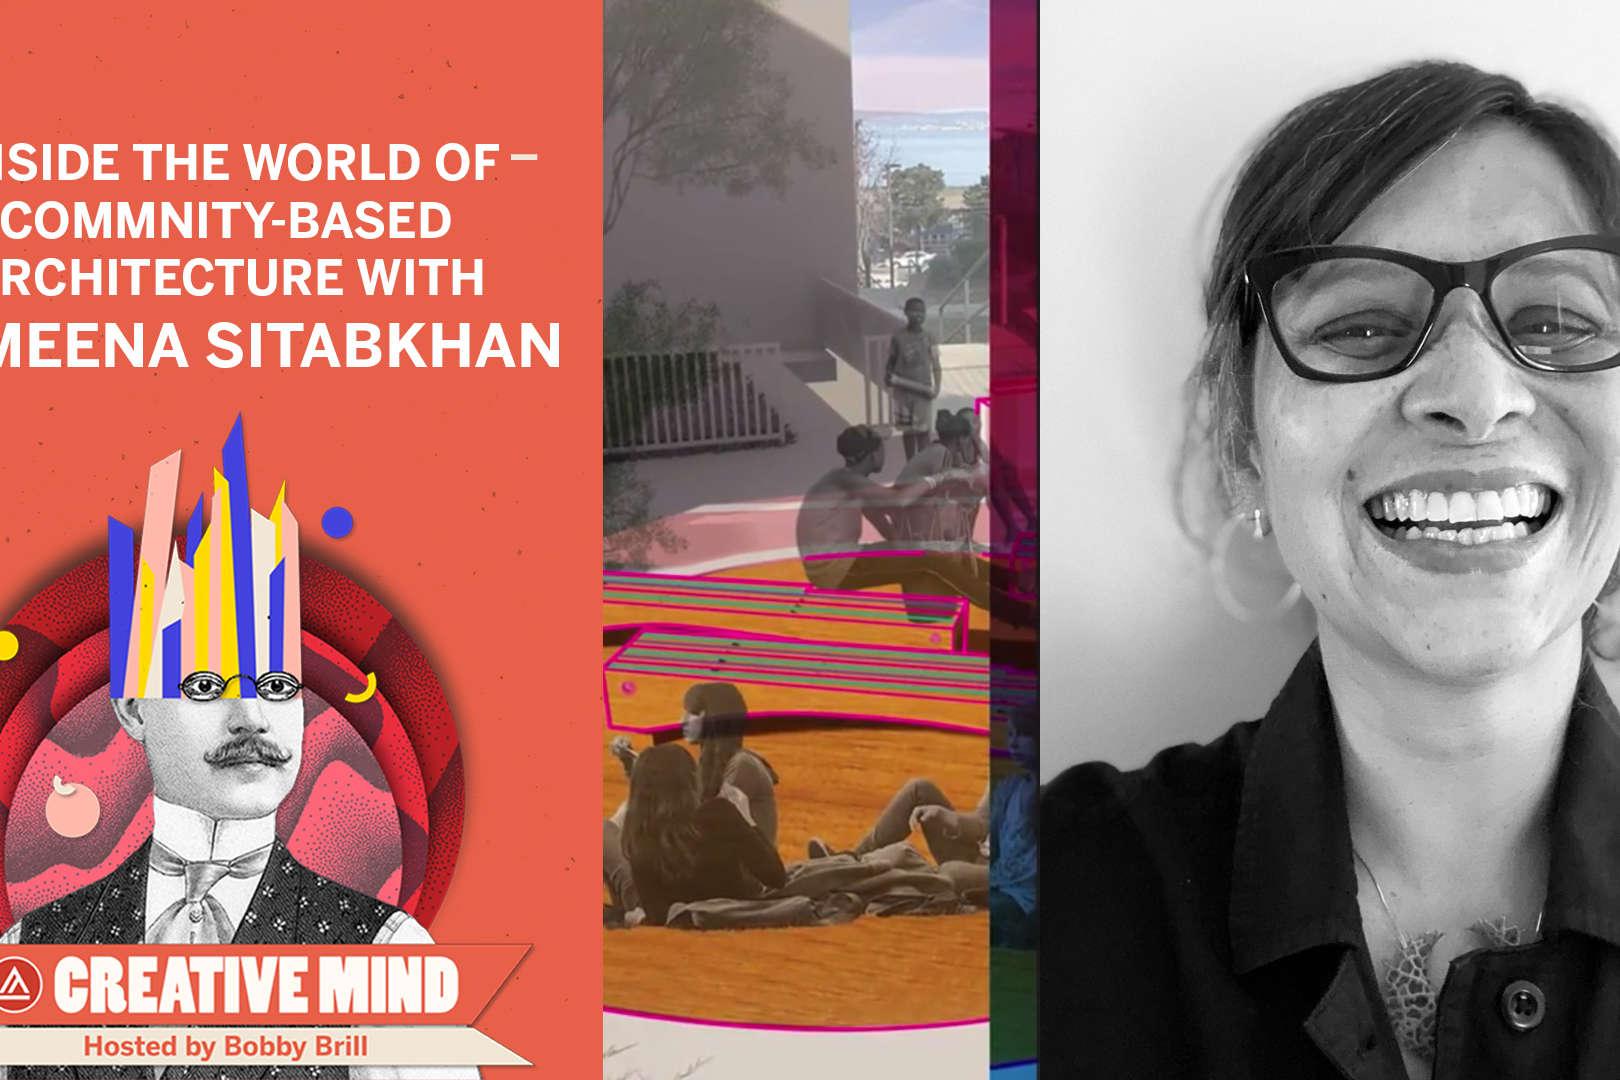 Sameena Sitabkhan - Creative Mind Podcast Episode 14